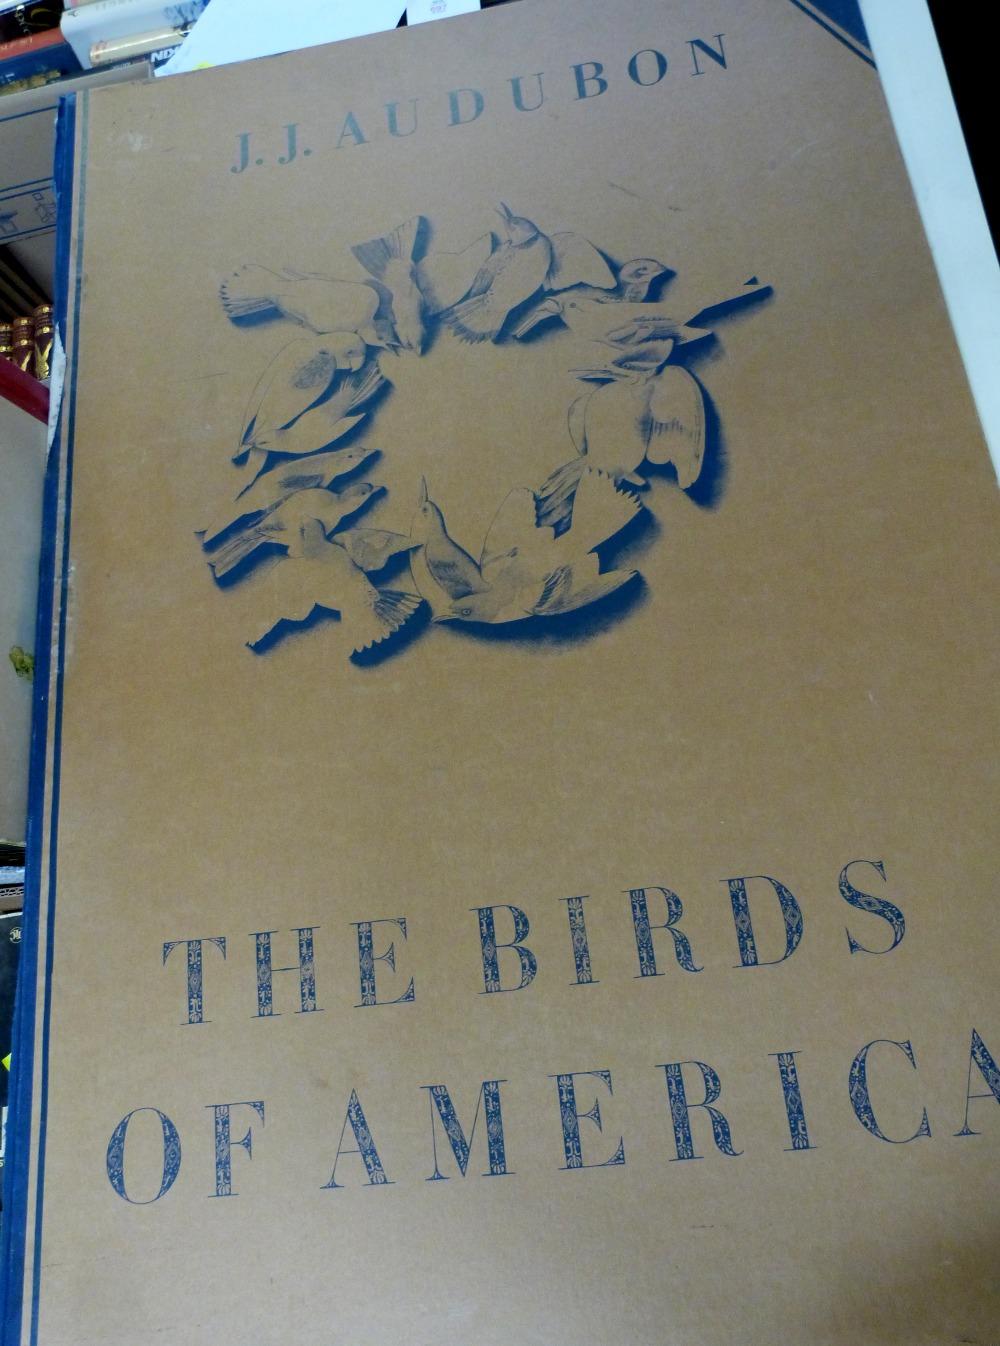 Lot 697 - *JOHN JAMES AUDUBON: BIRDS OF AMERICA, A SELECTION OF LANDSCAPE PLATES, Ariel Press, 1973, (1000),